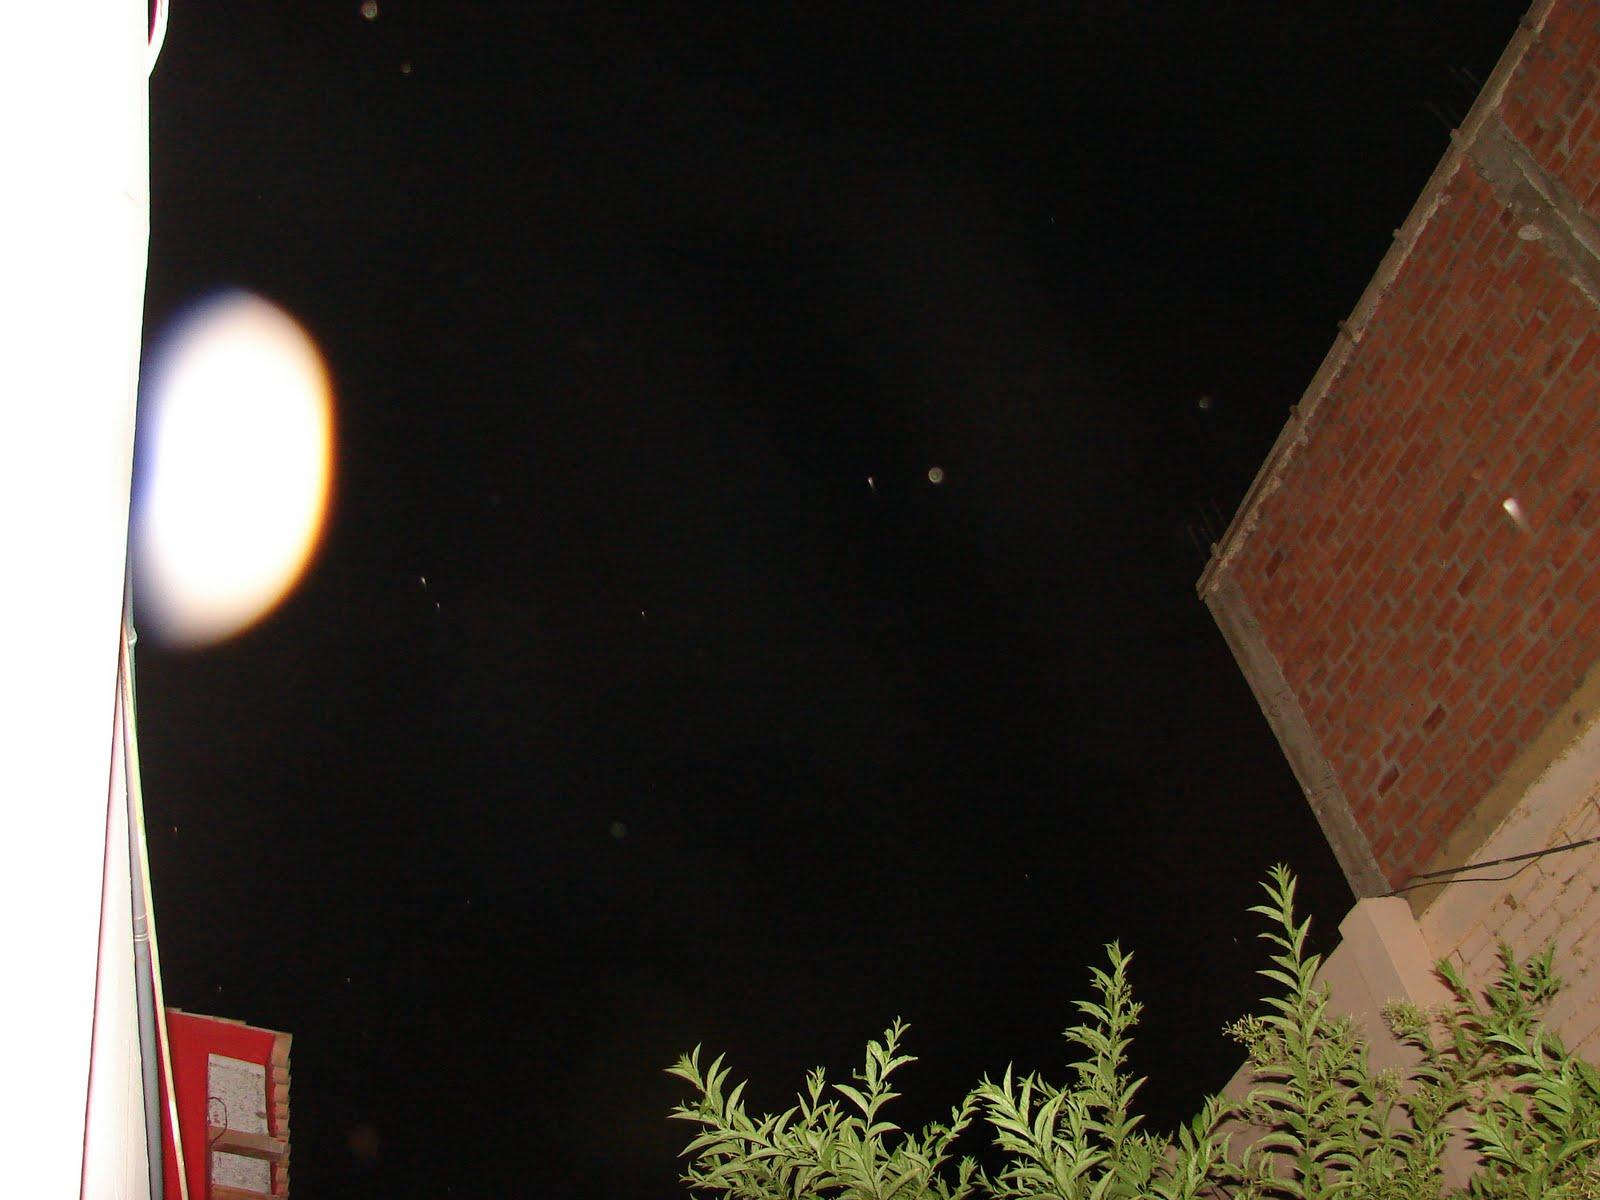 Super 13-febrero-14-15-16-17...2011 avistamiento Ovi,Ovni de Dios, sec casa Jardin 1;13:01 am